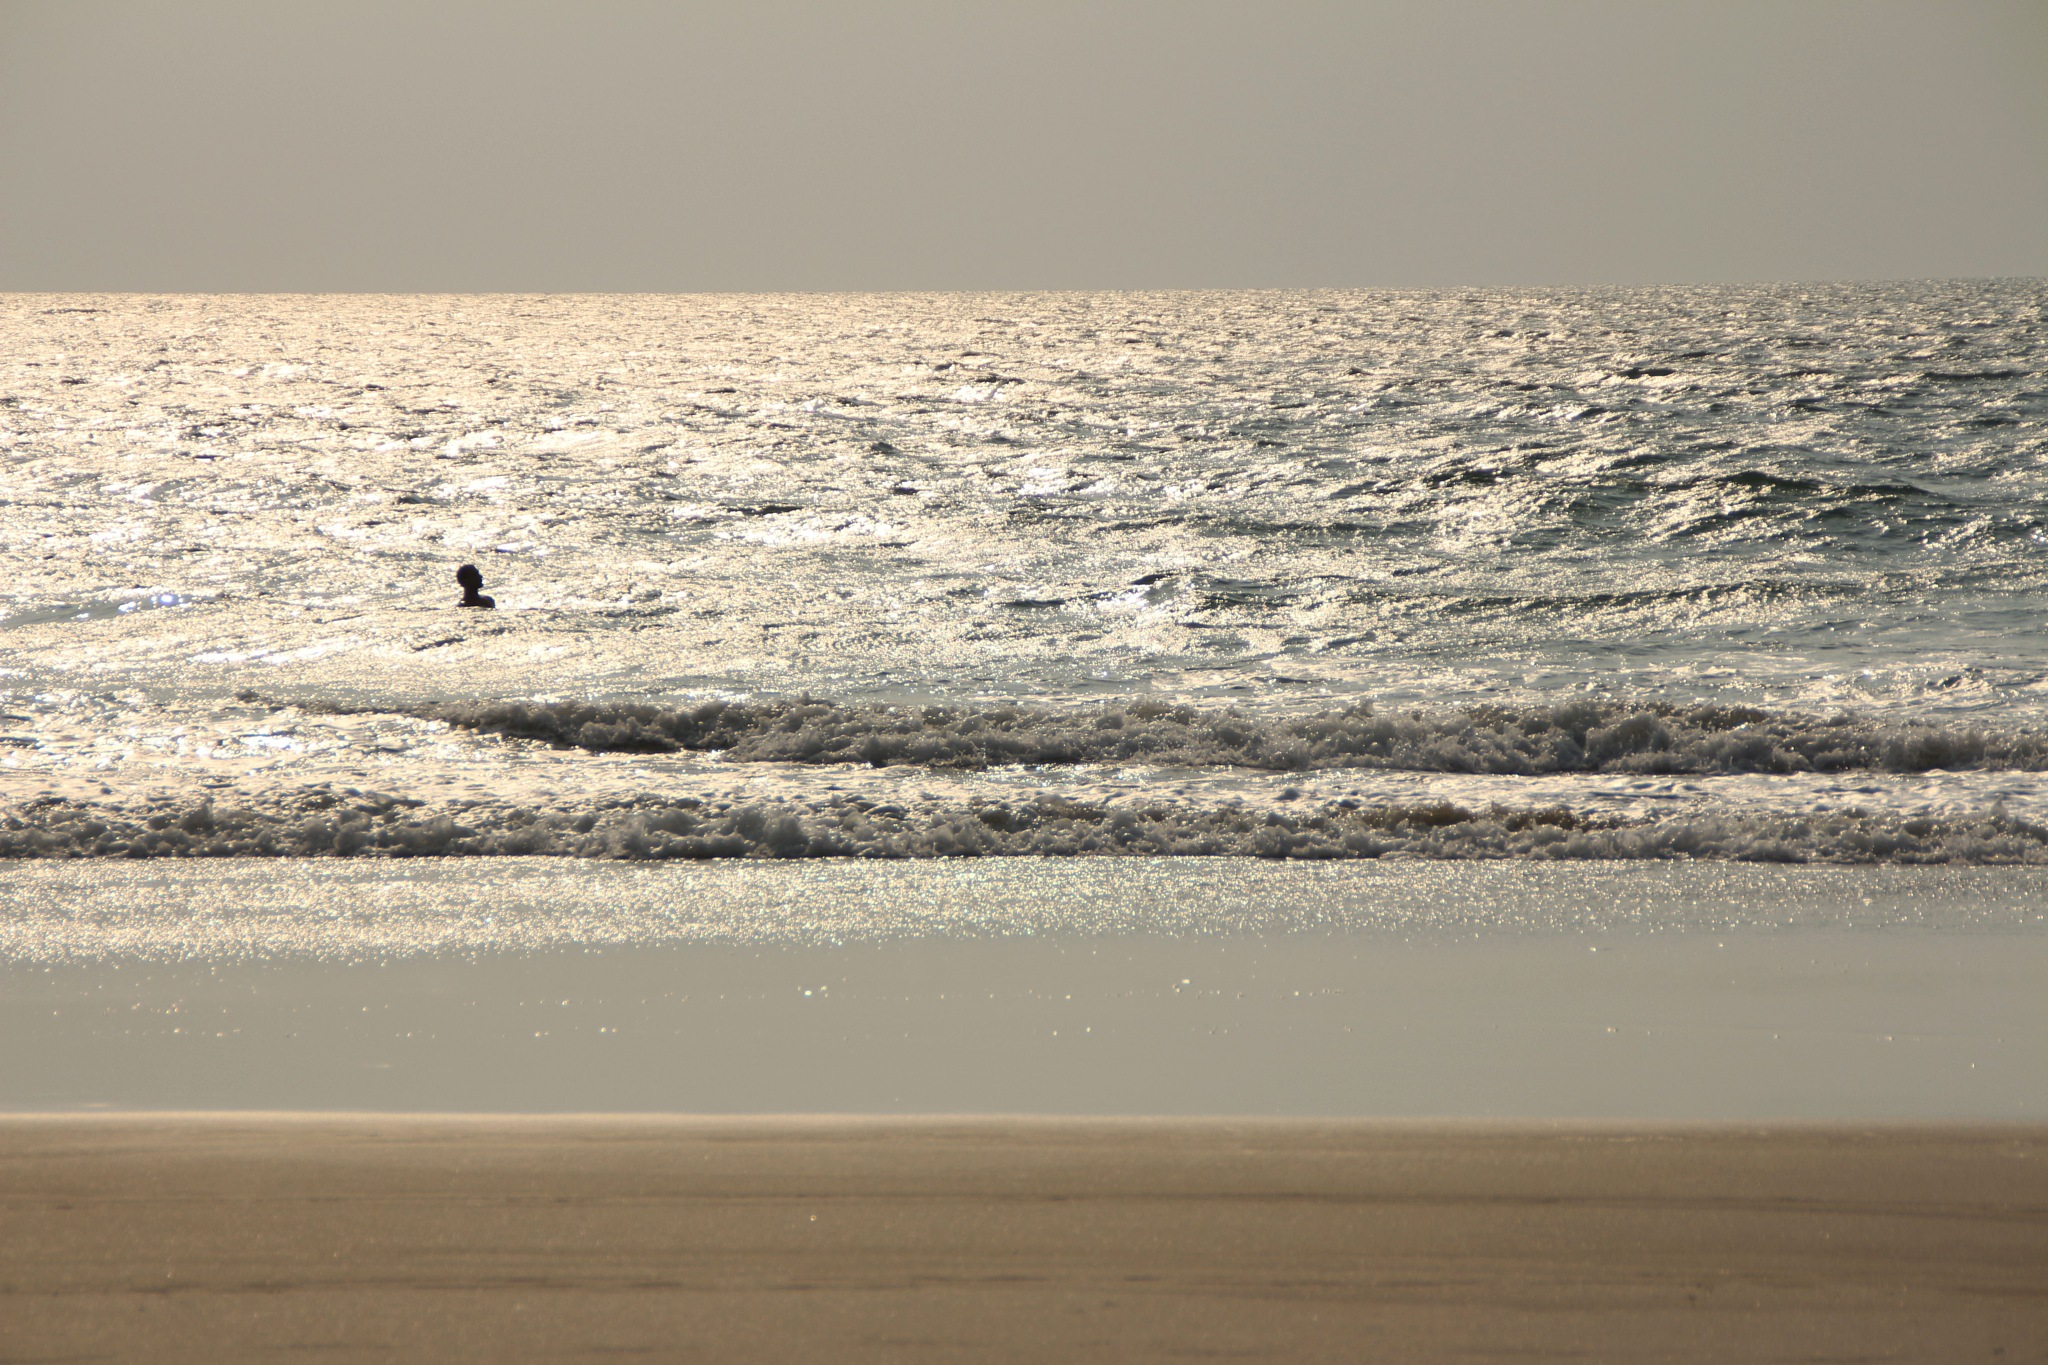 Arabian sea by inge.kanakarisW